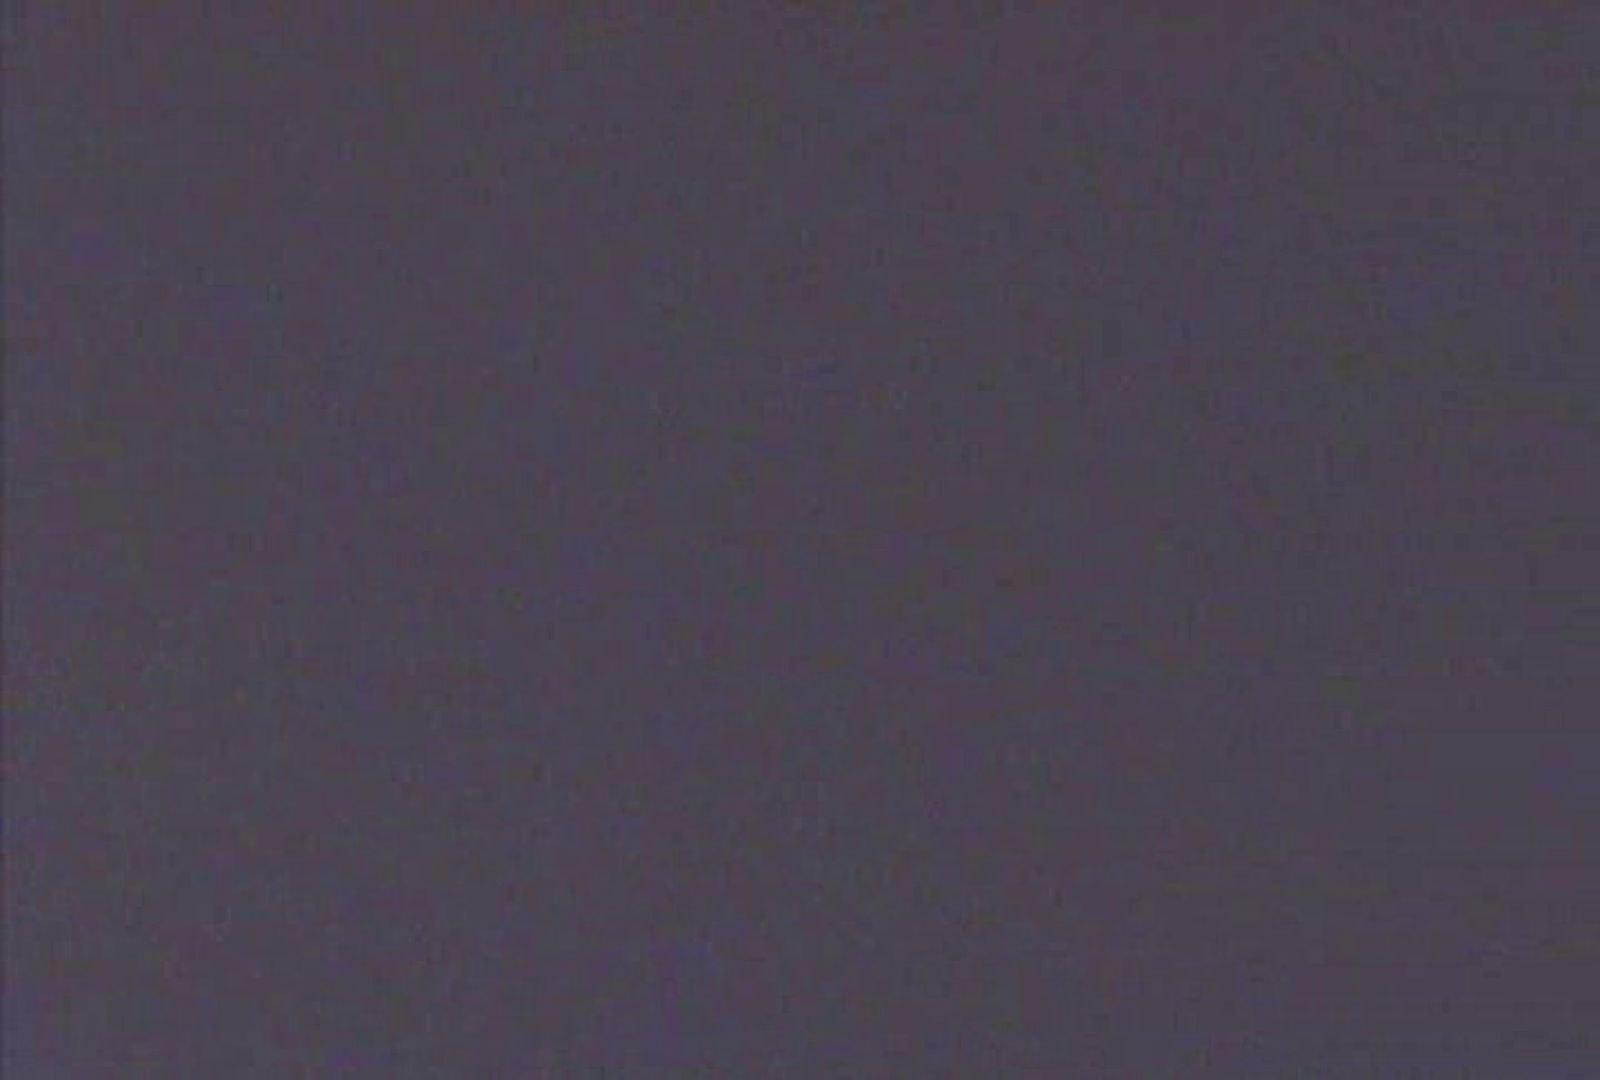 素人投稿シリーズ 盗撮 覗きの穴場 大浴場編  Vol.2 盗撮大放出  96連発 72